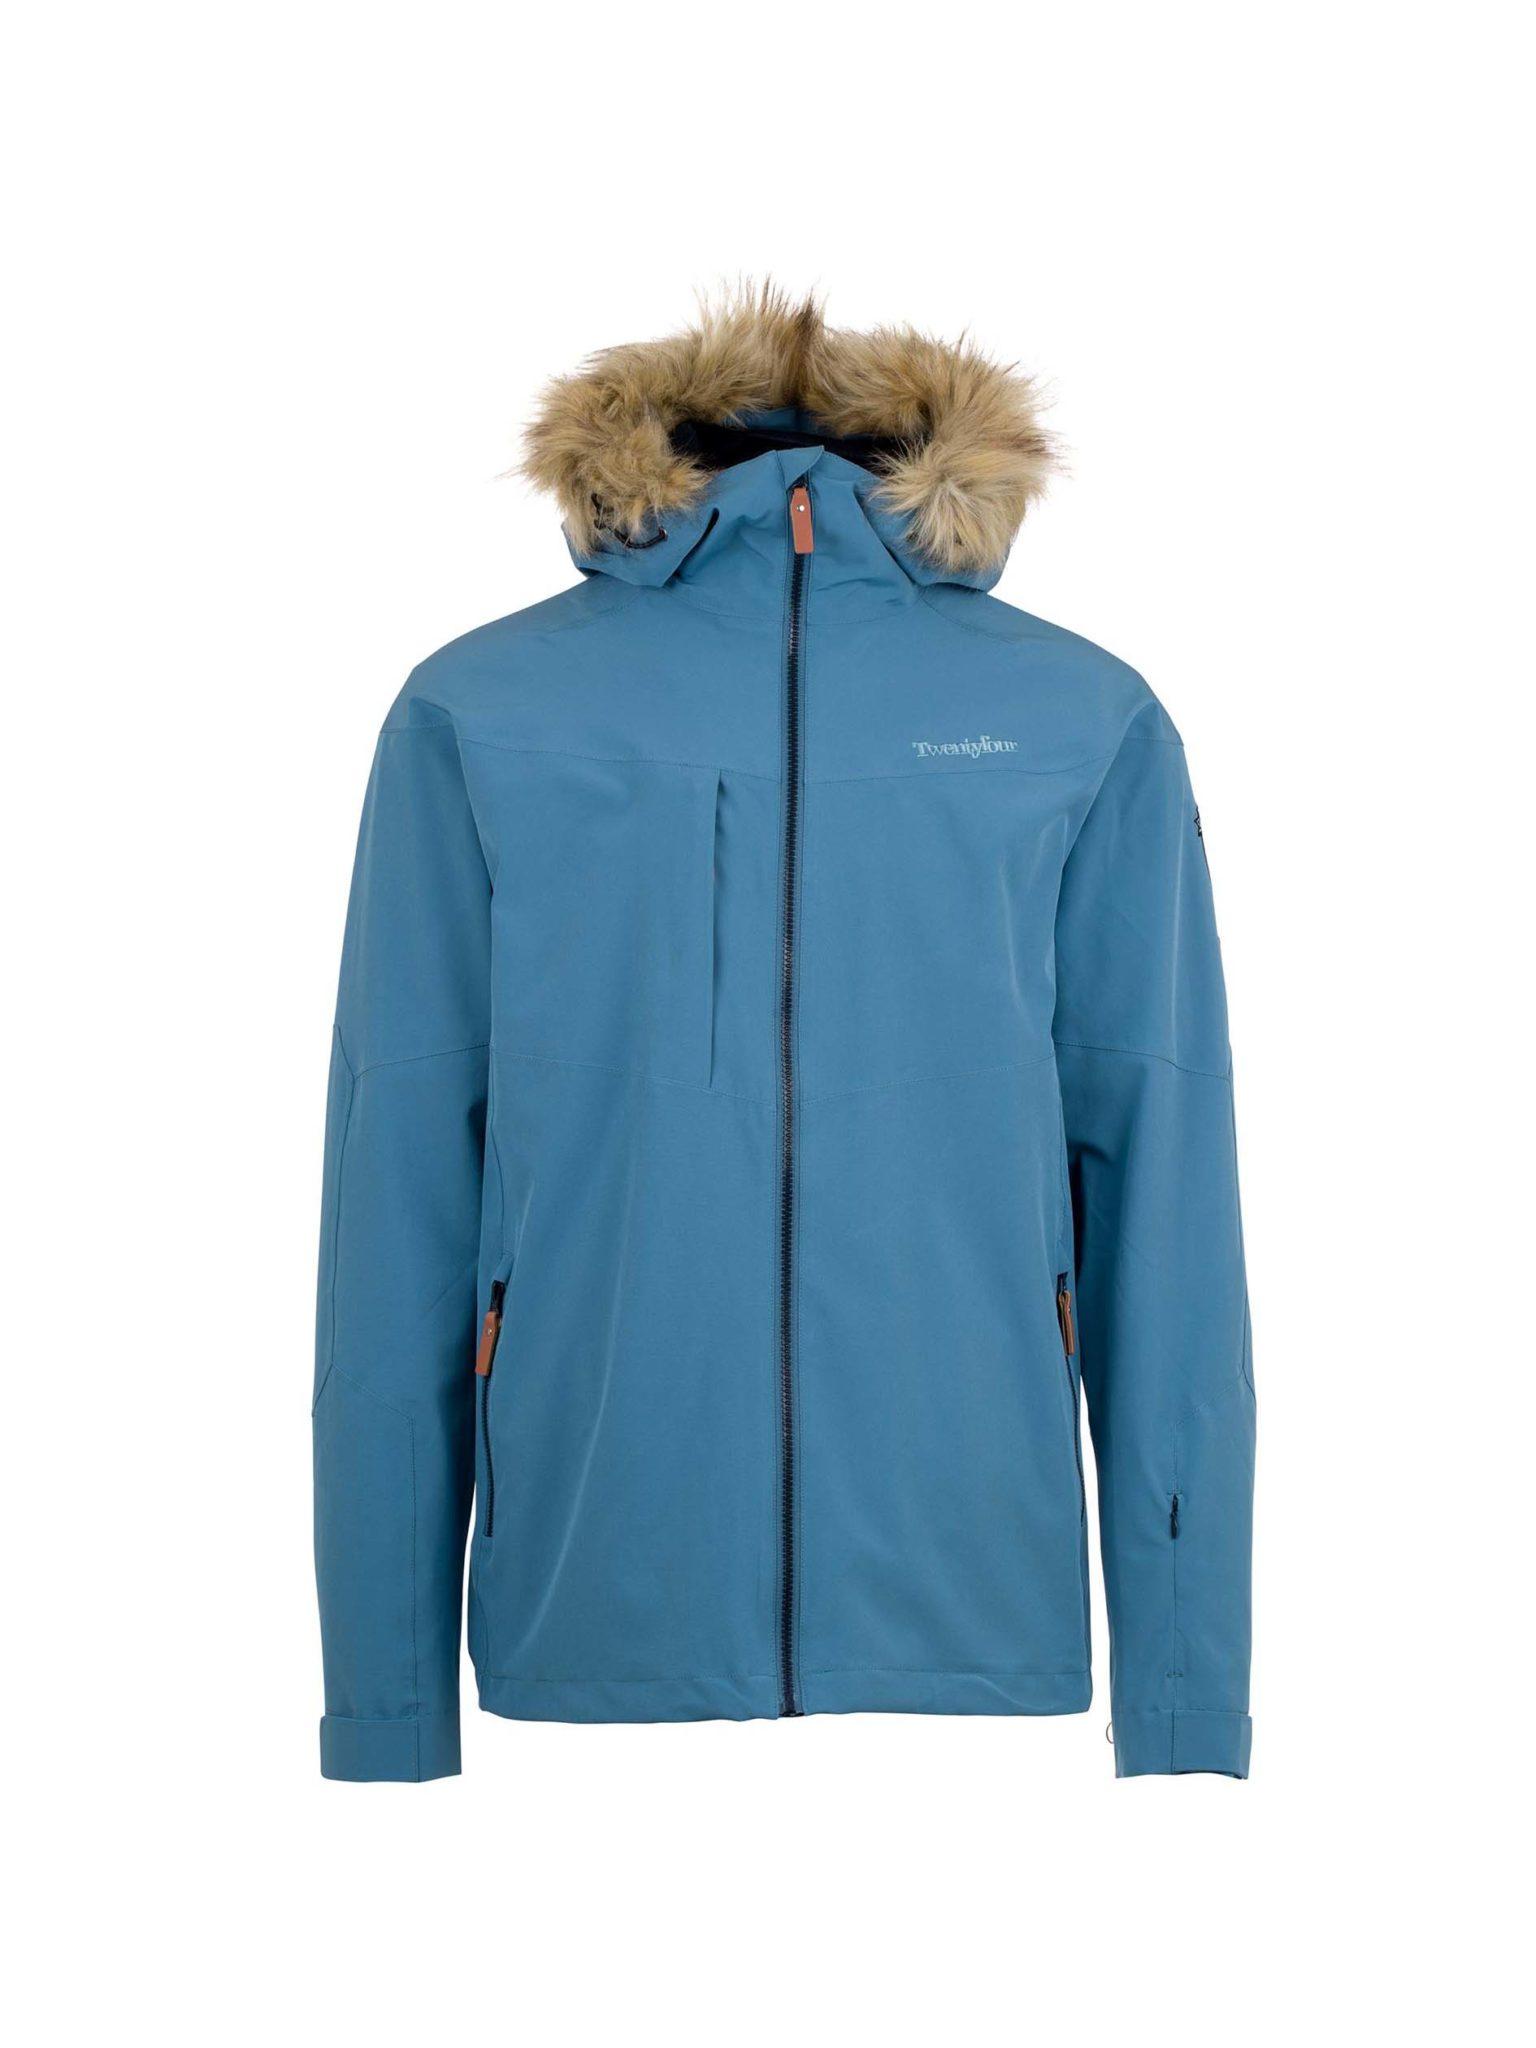 Twentyfour Finse 2 lags jakke, nattblå. Alle tiders